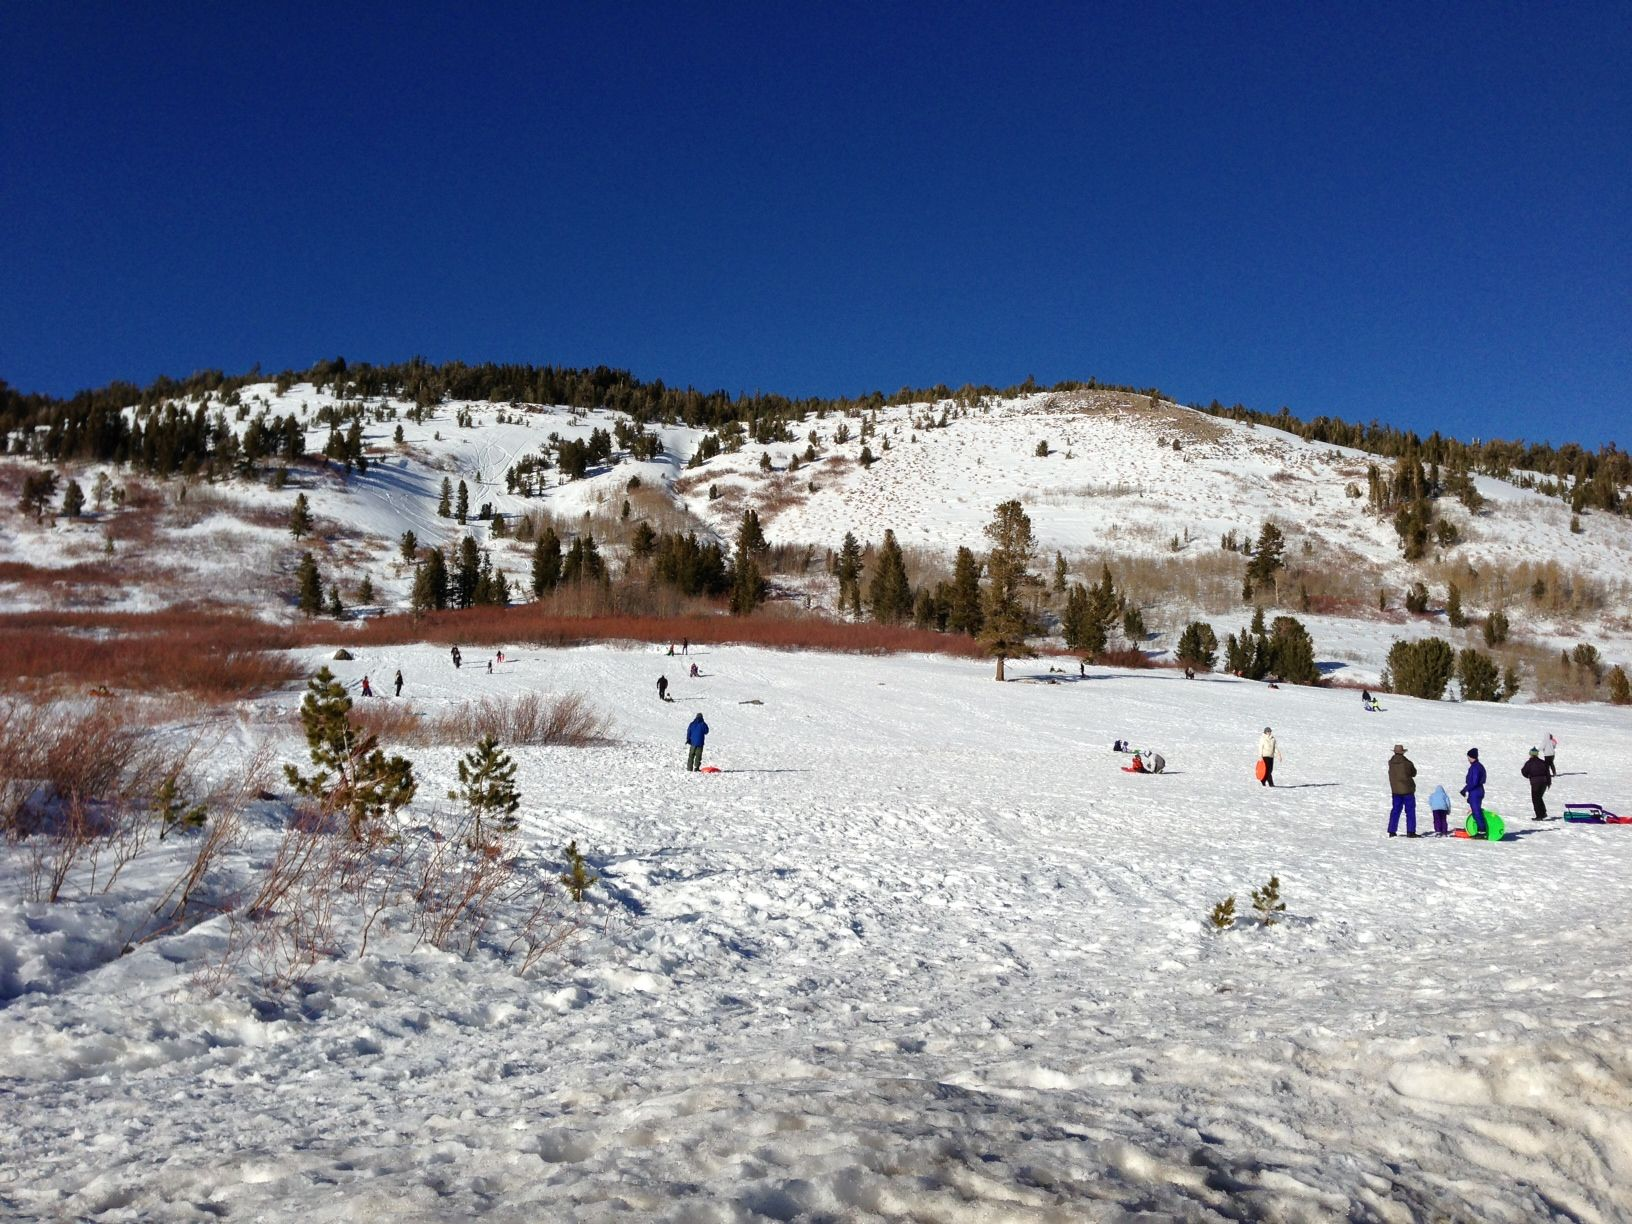 Tahoe Meadows sledding slope Places to visit, Tahoe